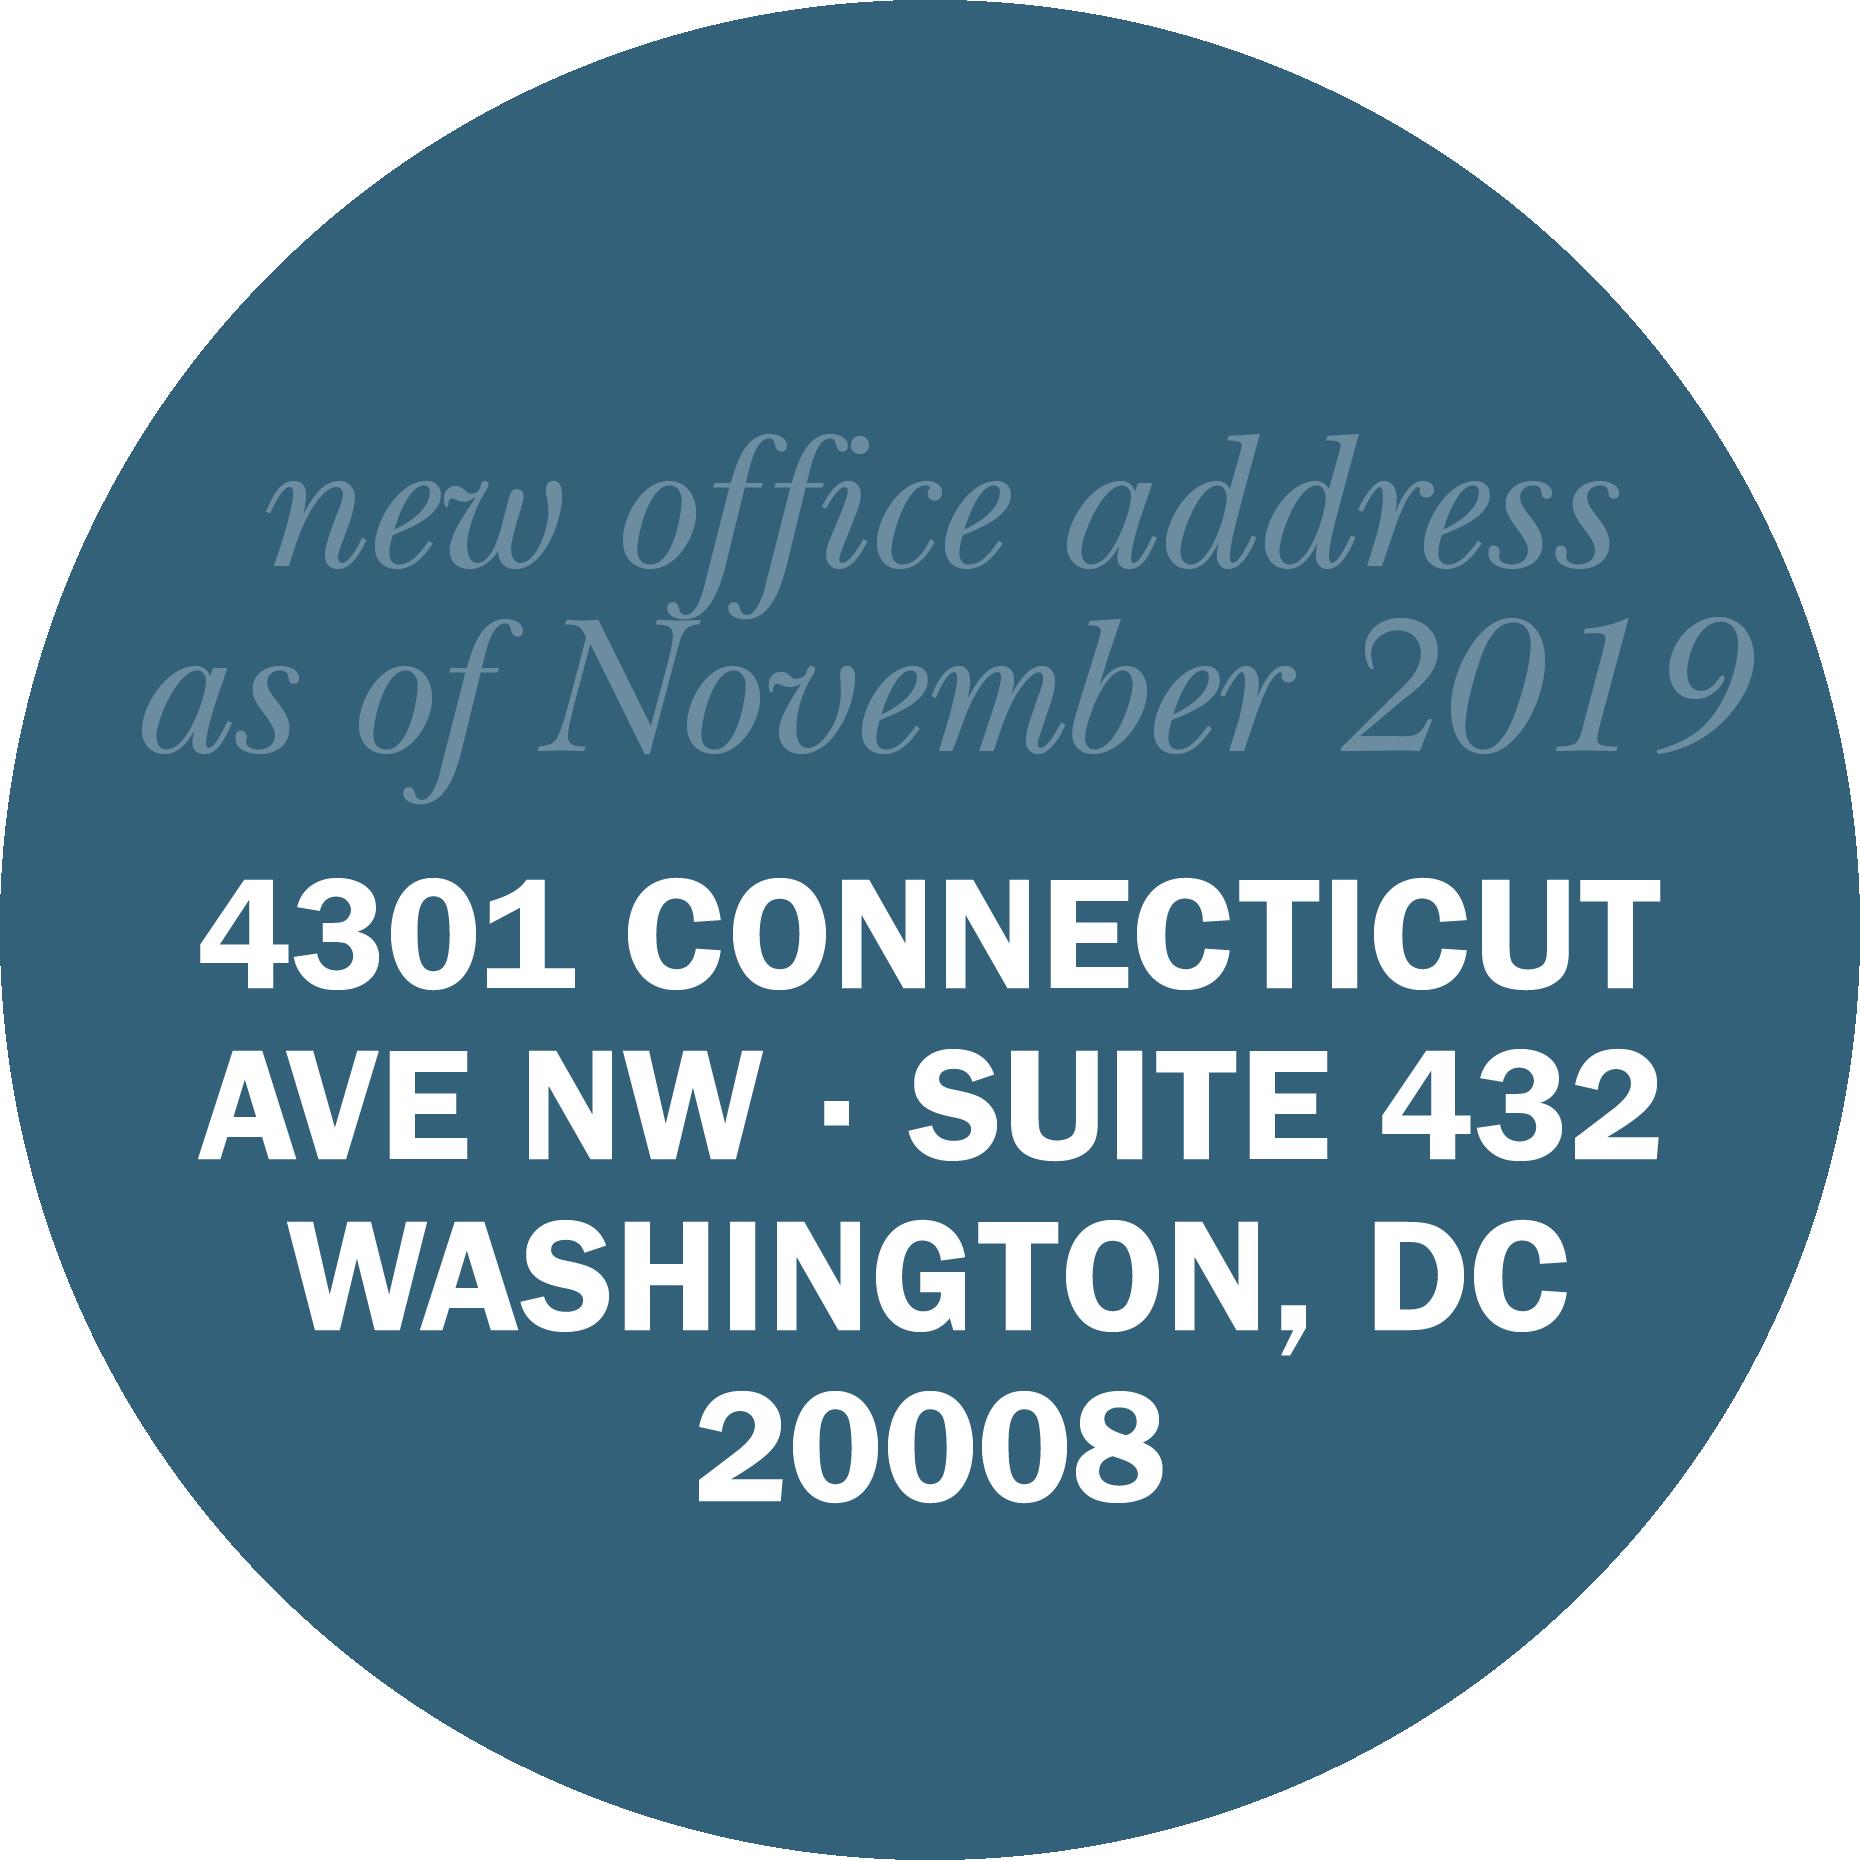 BKP-002-2019-MovingAnnouncementBurstGraphic_v1.png